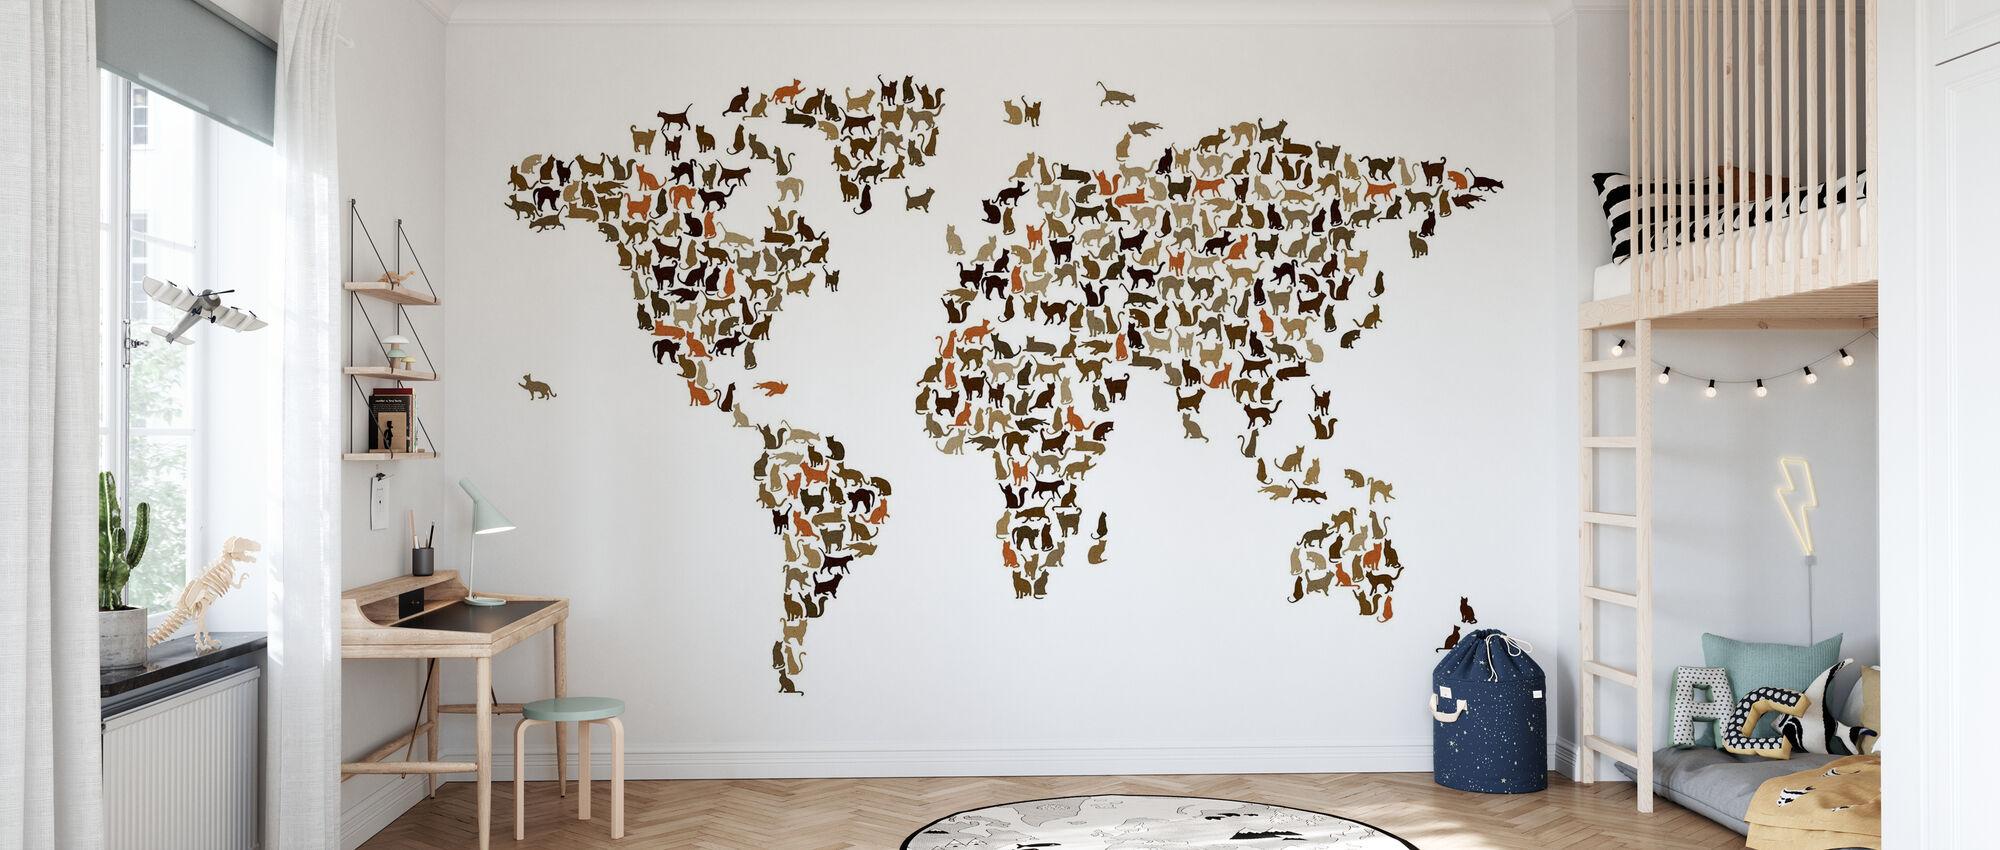 Cats Weltkarte - Tapete - Kinderzimmer